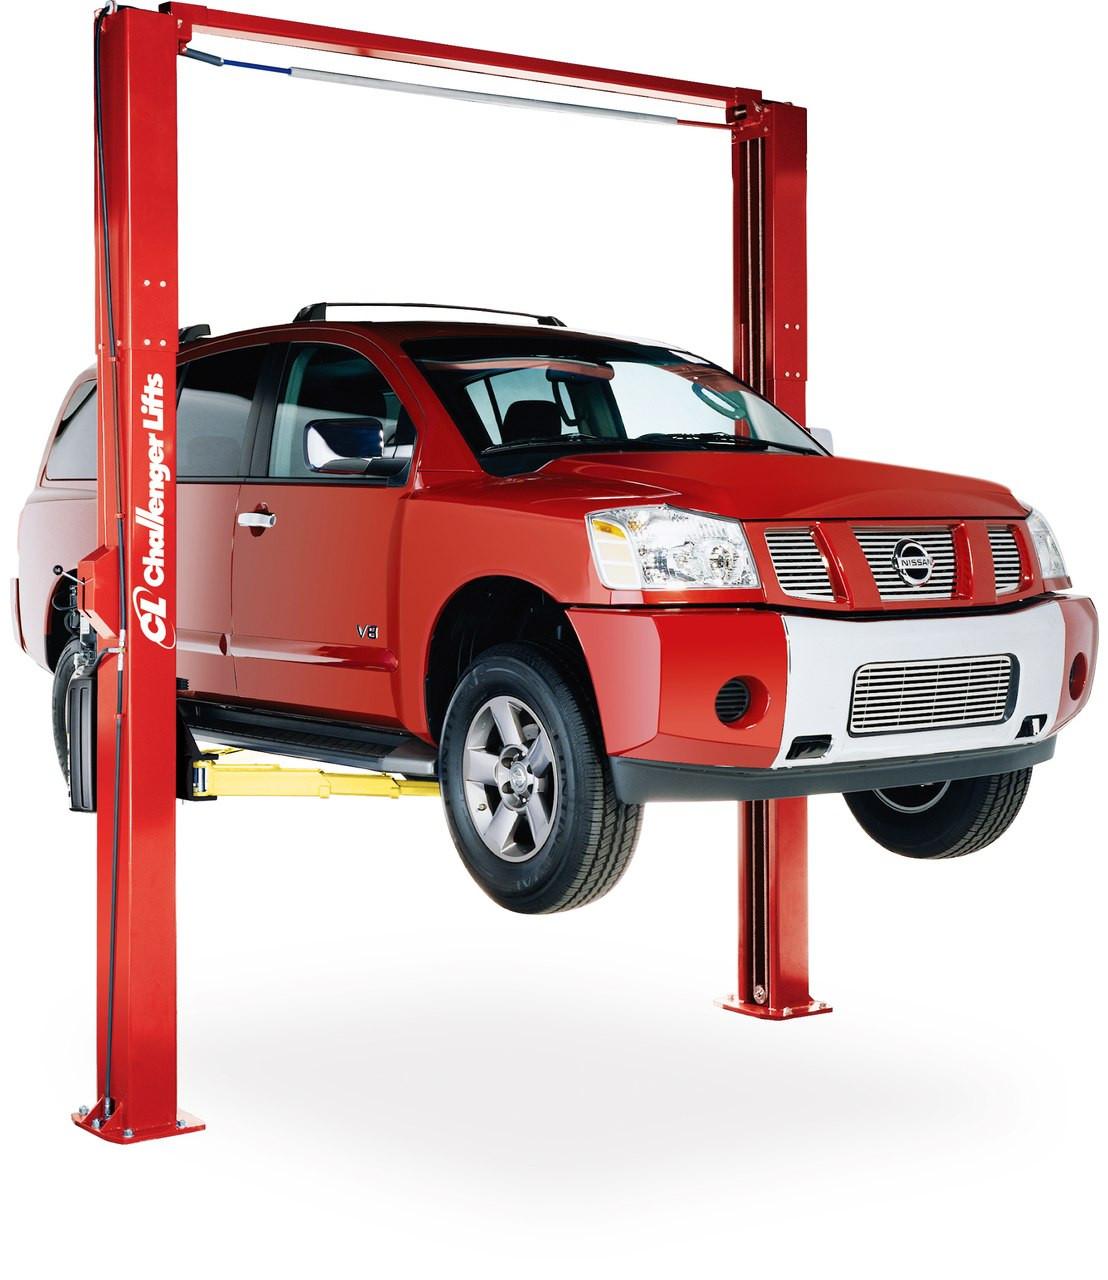 Challenger Lifts Le10 Symmetric Asymmetric Two Post Car Lift